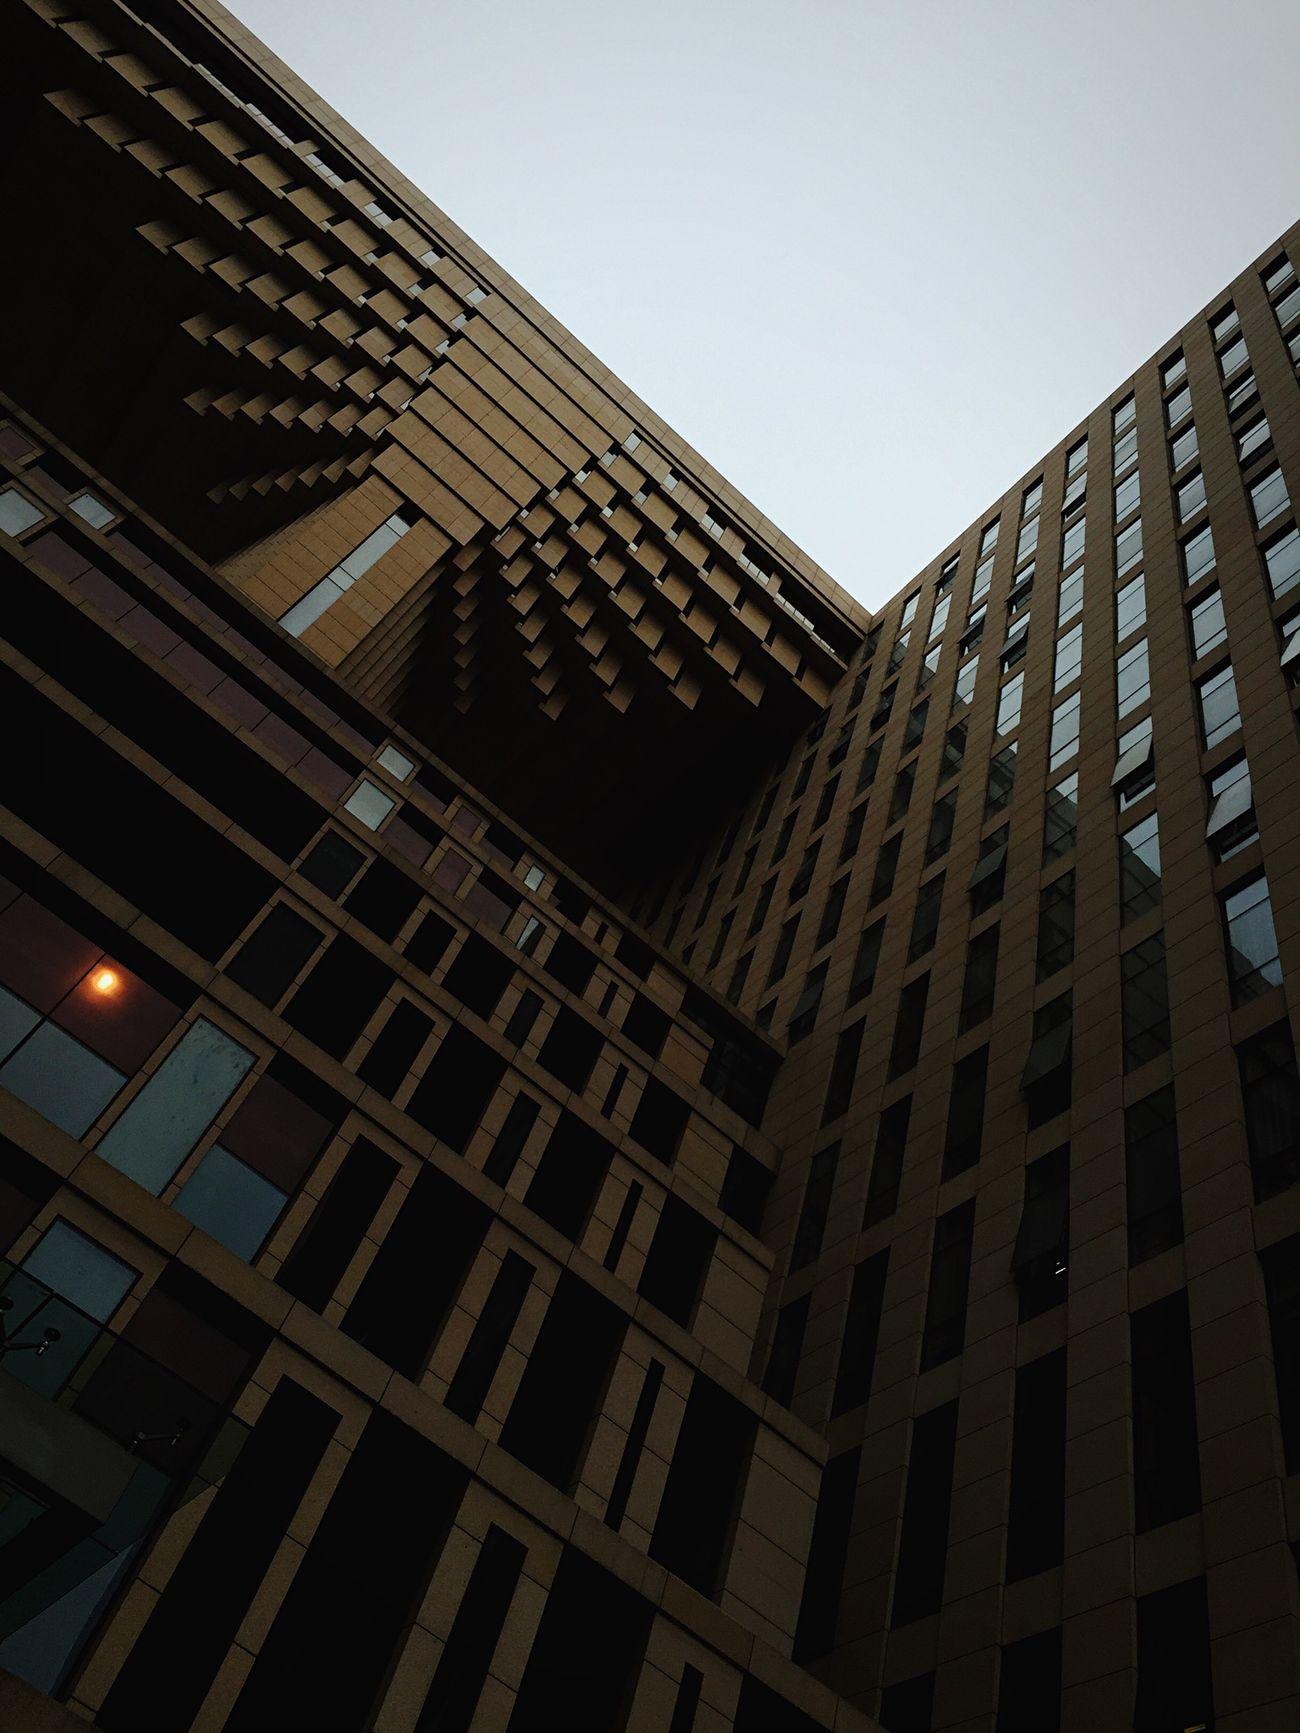 学研大厦 Architecture